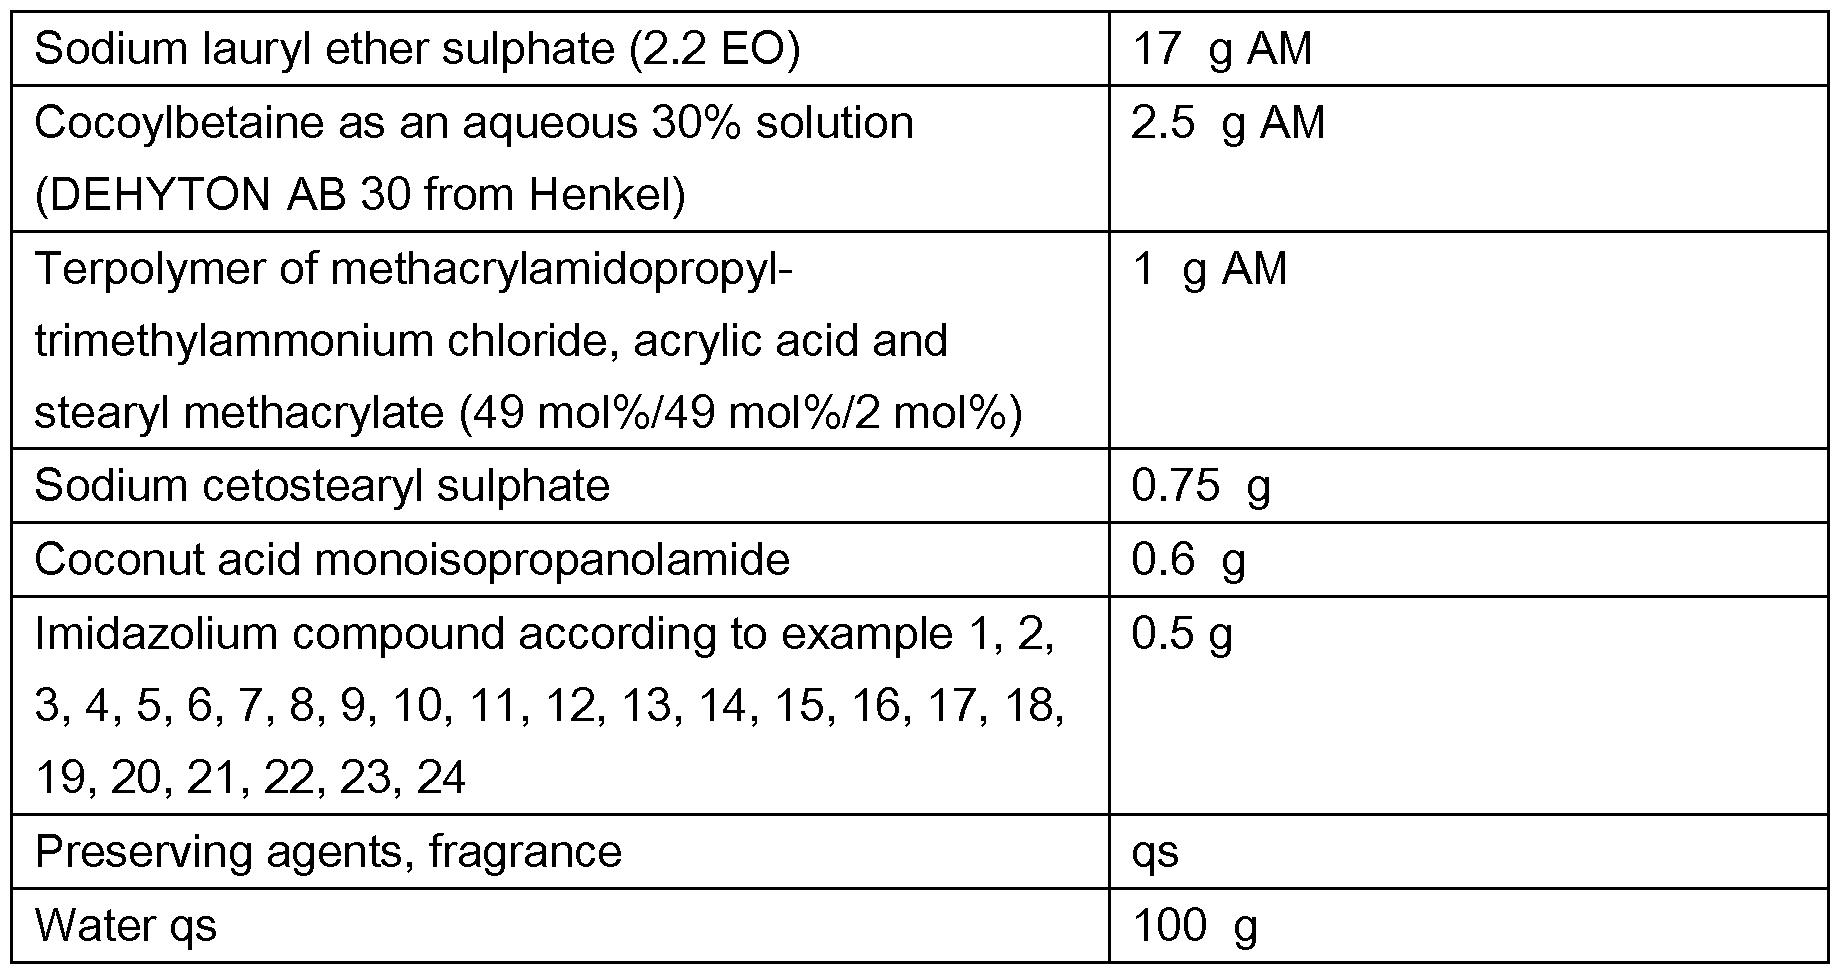 cymbalta generic